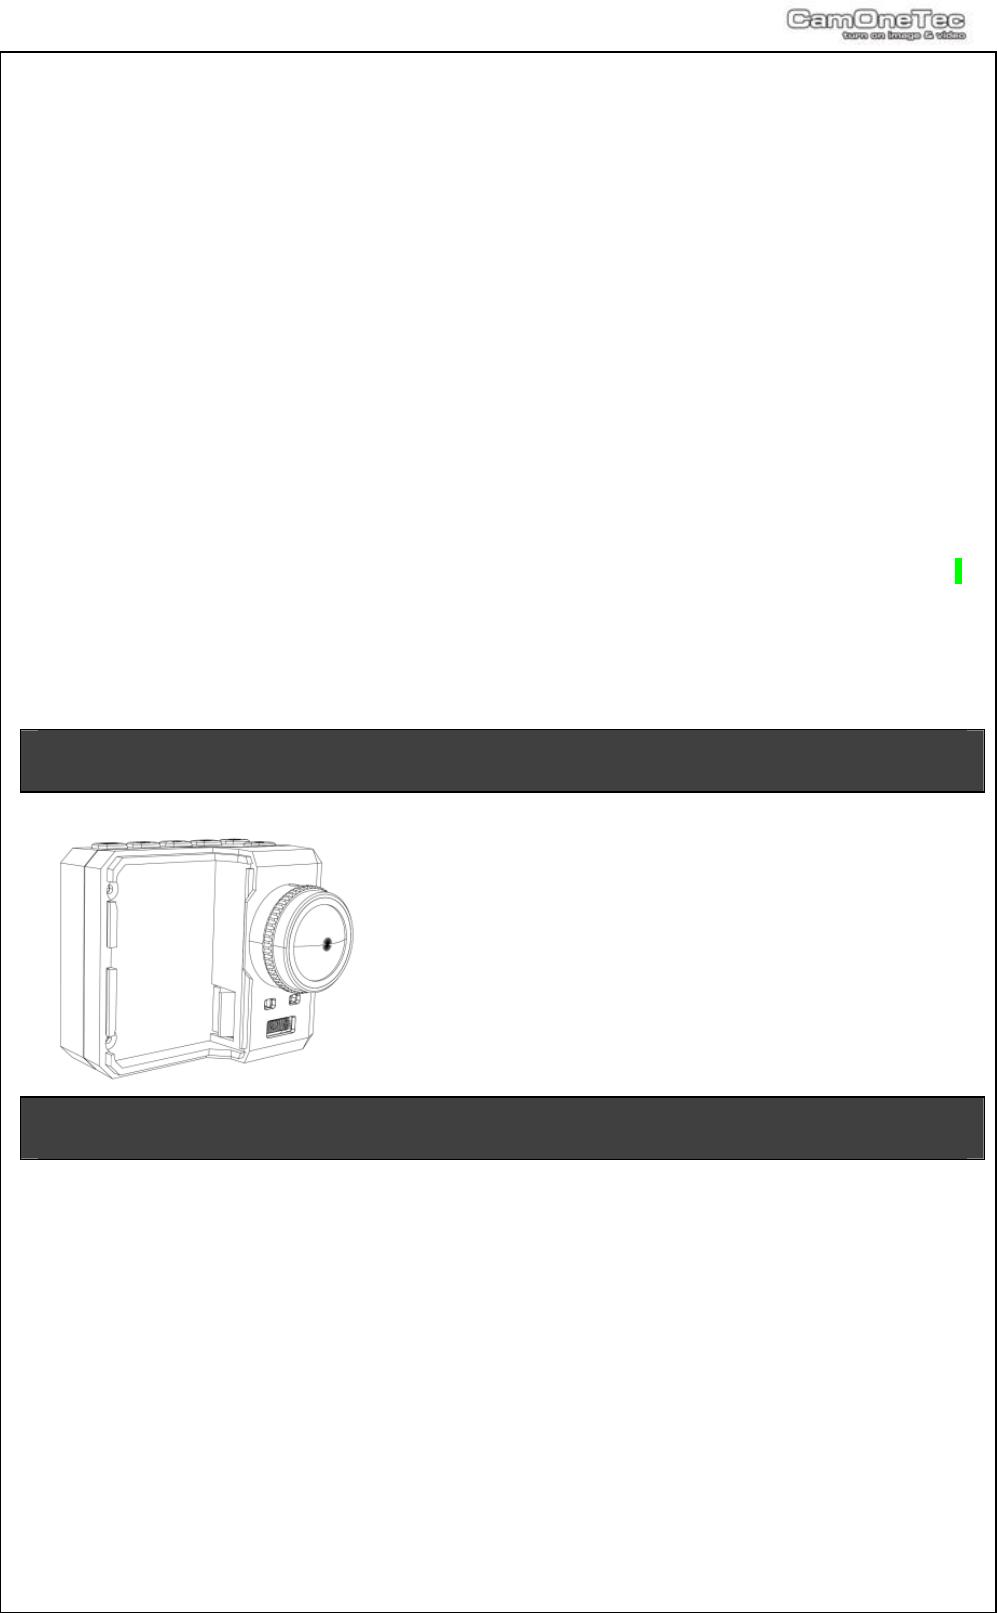 Handleiding Camone Infinity Pagina 1 Van 16 English